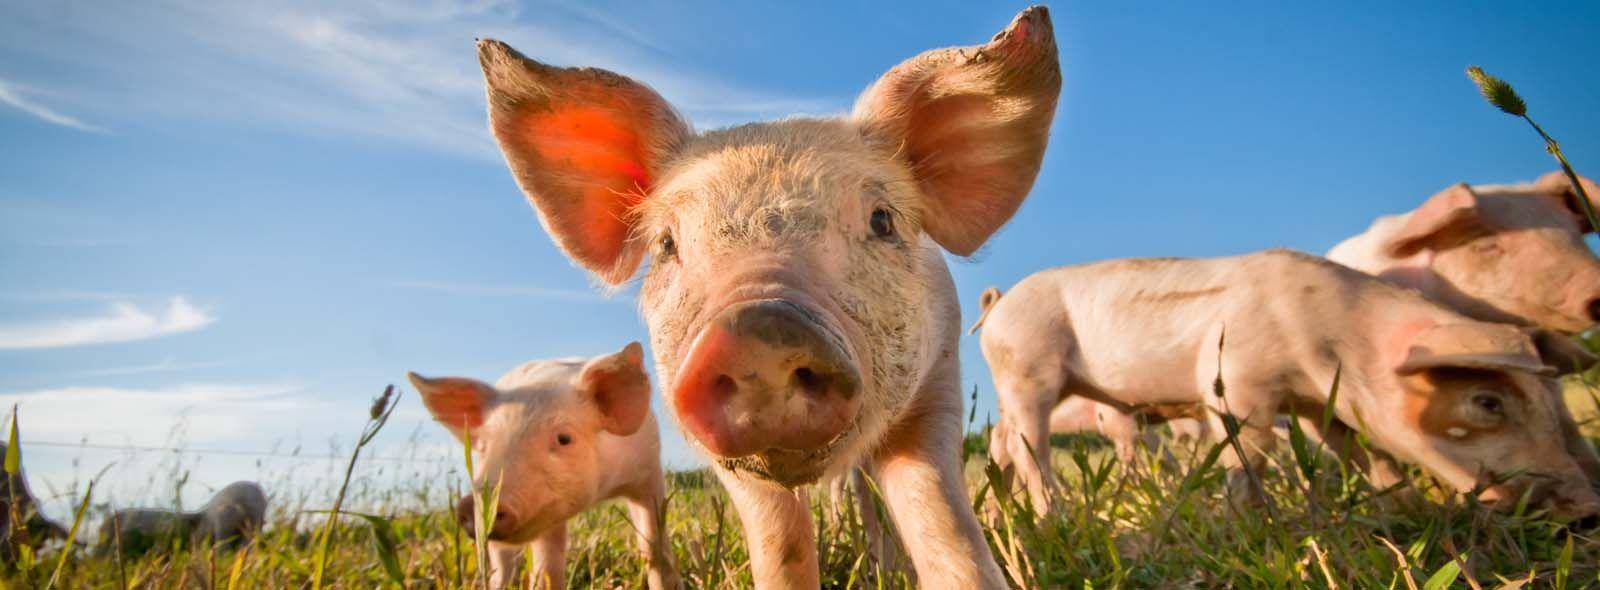 Come allevare un maiale